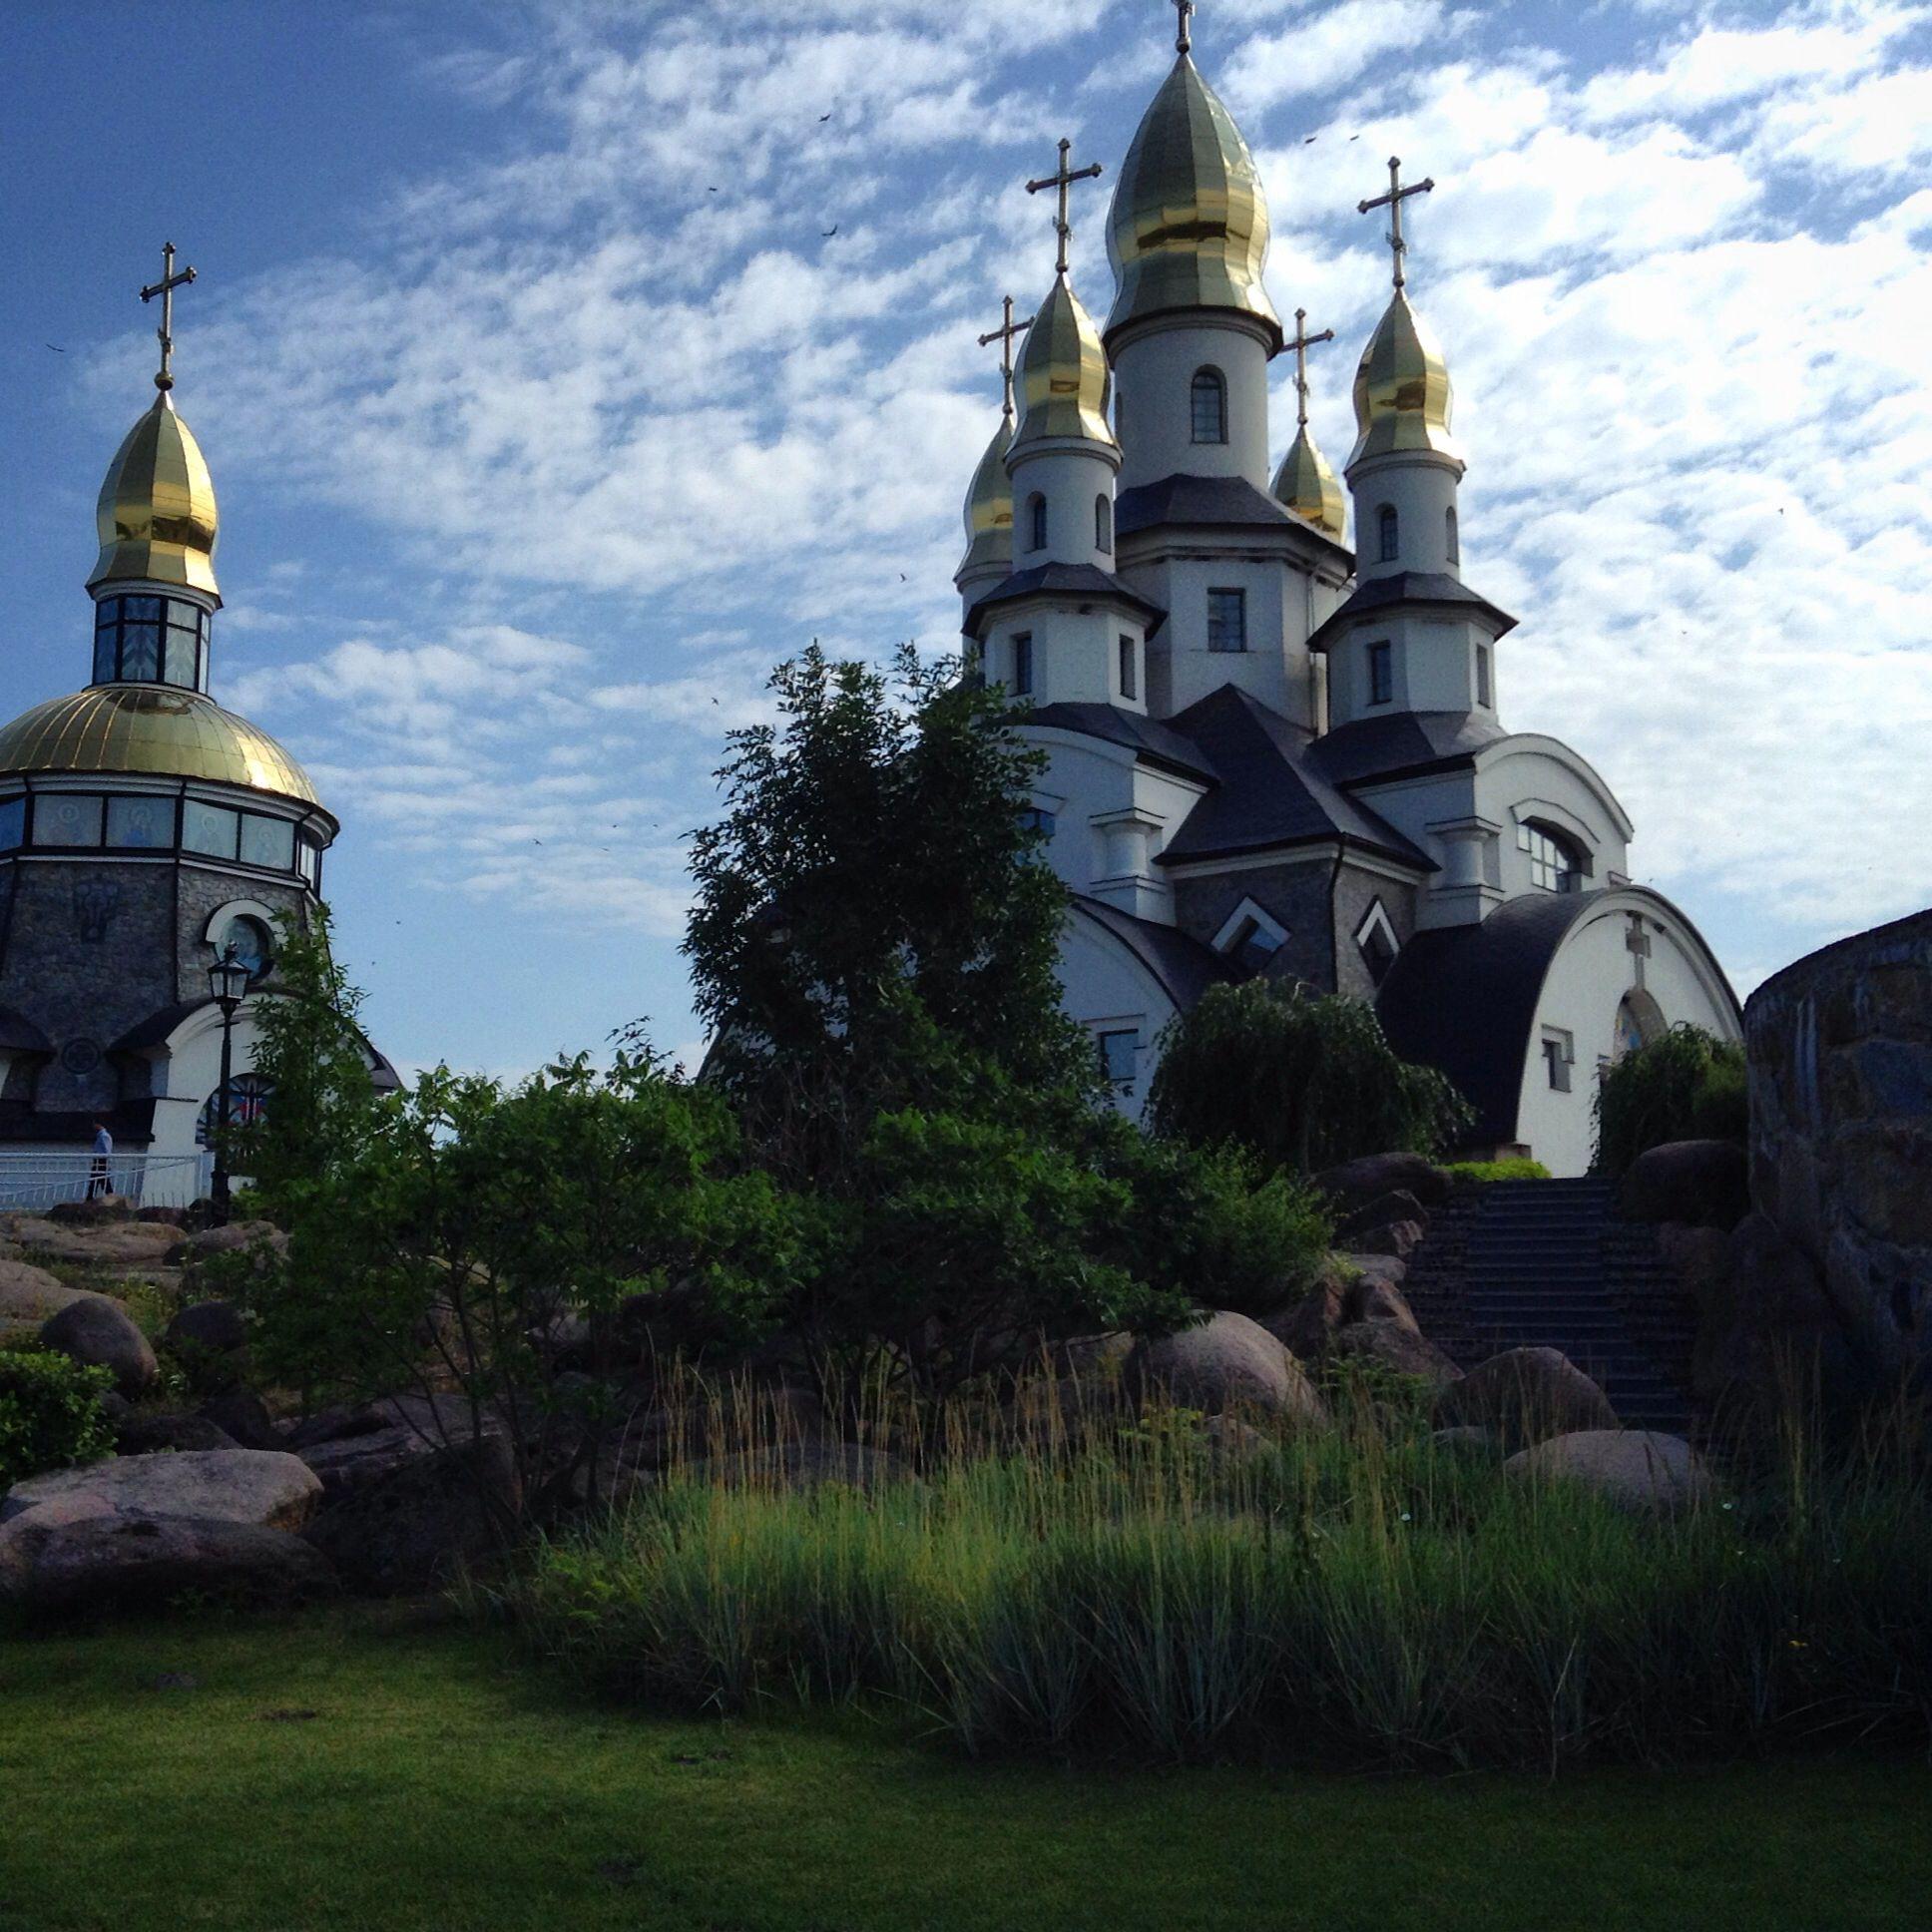 Ukraine is beautiful